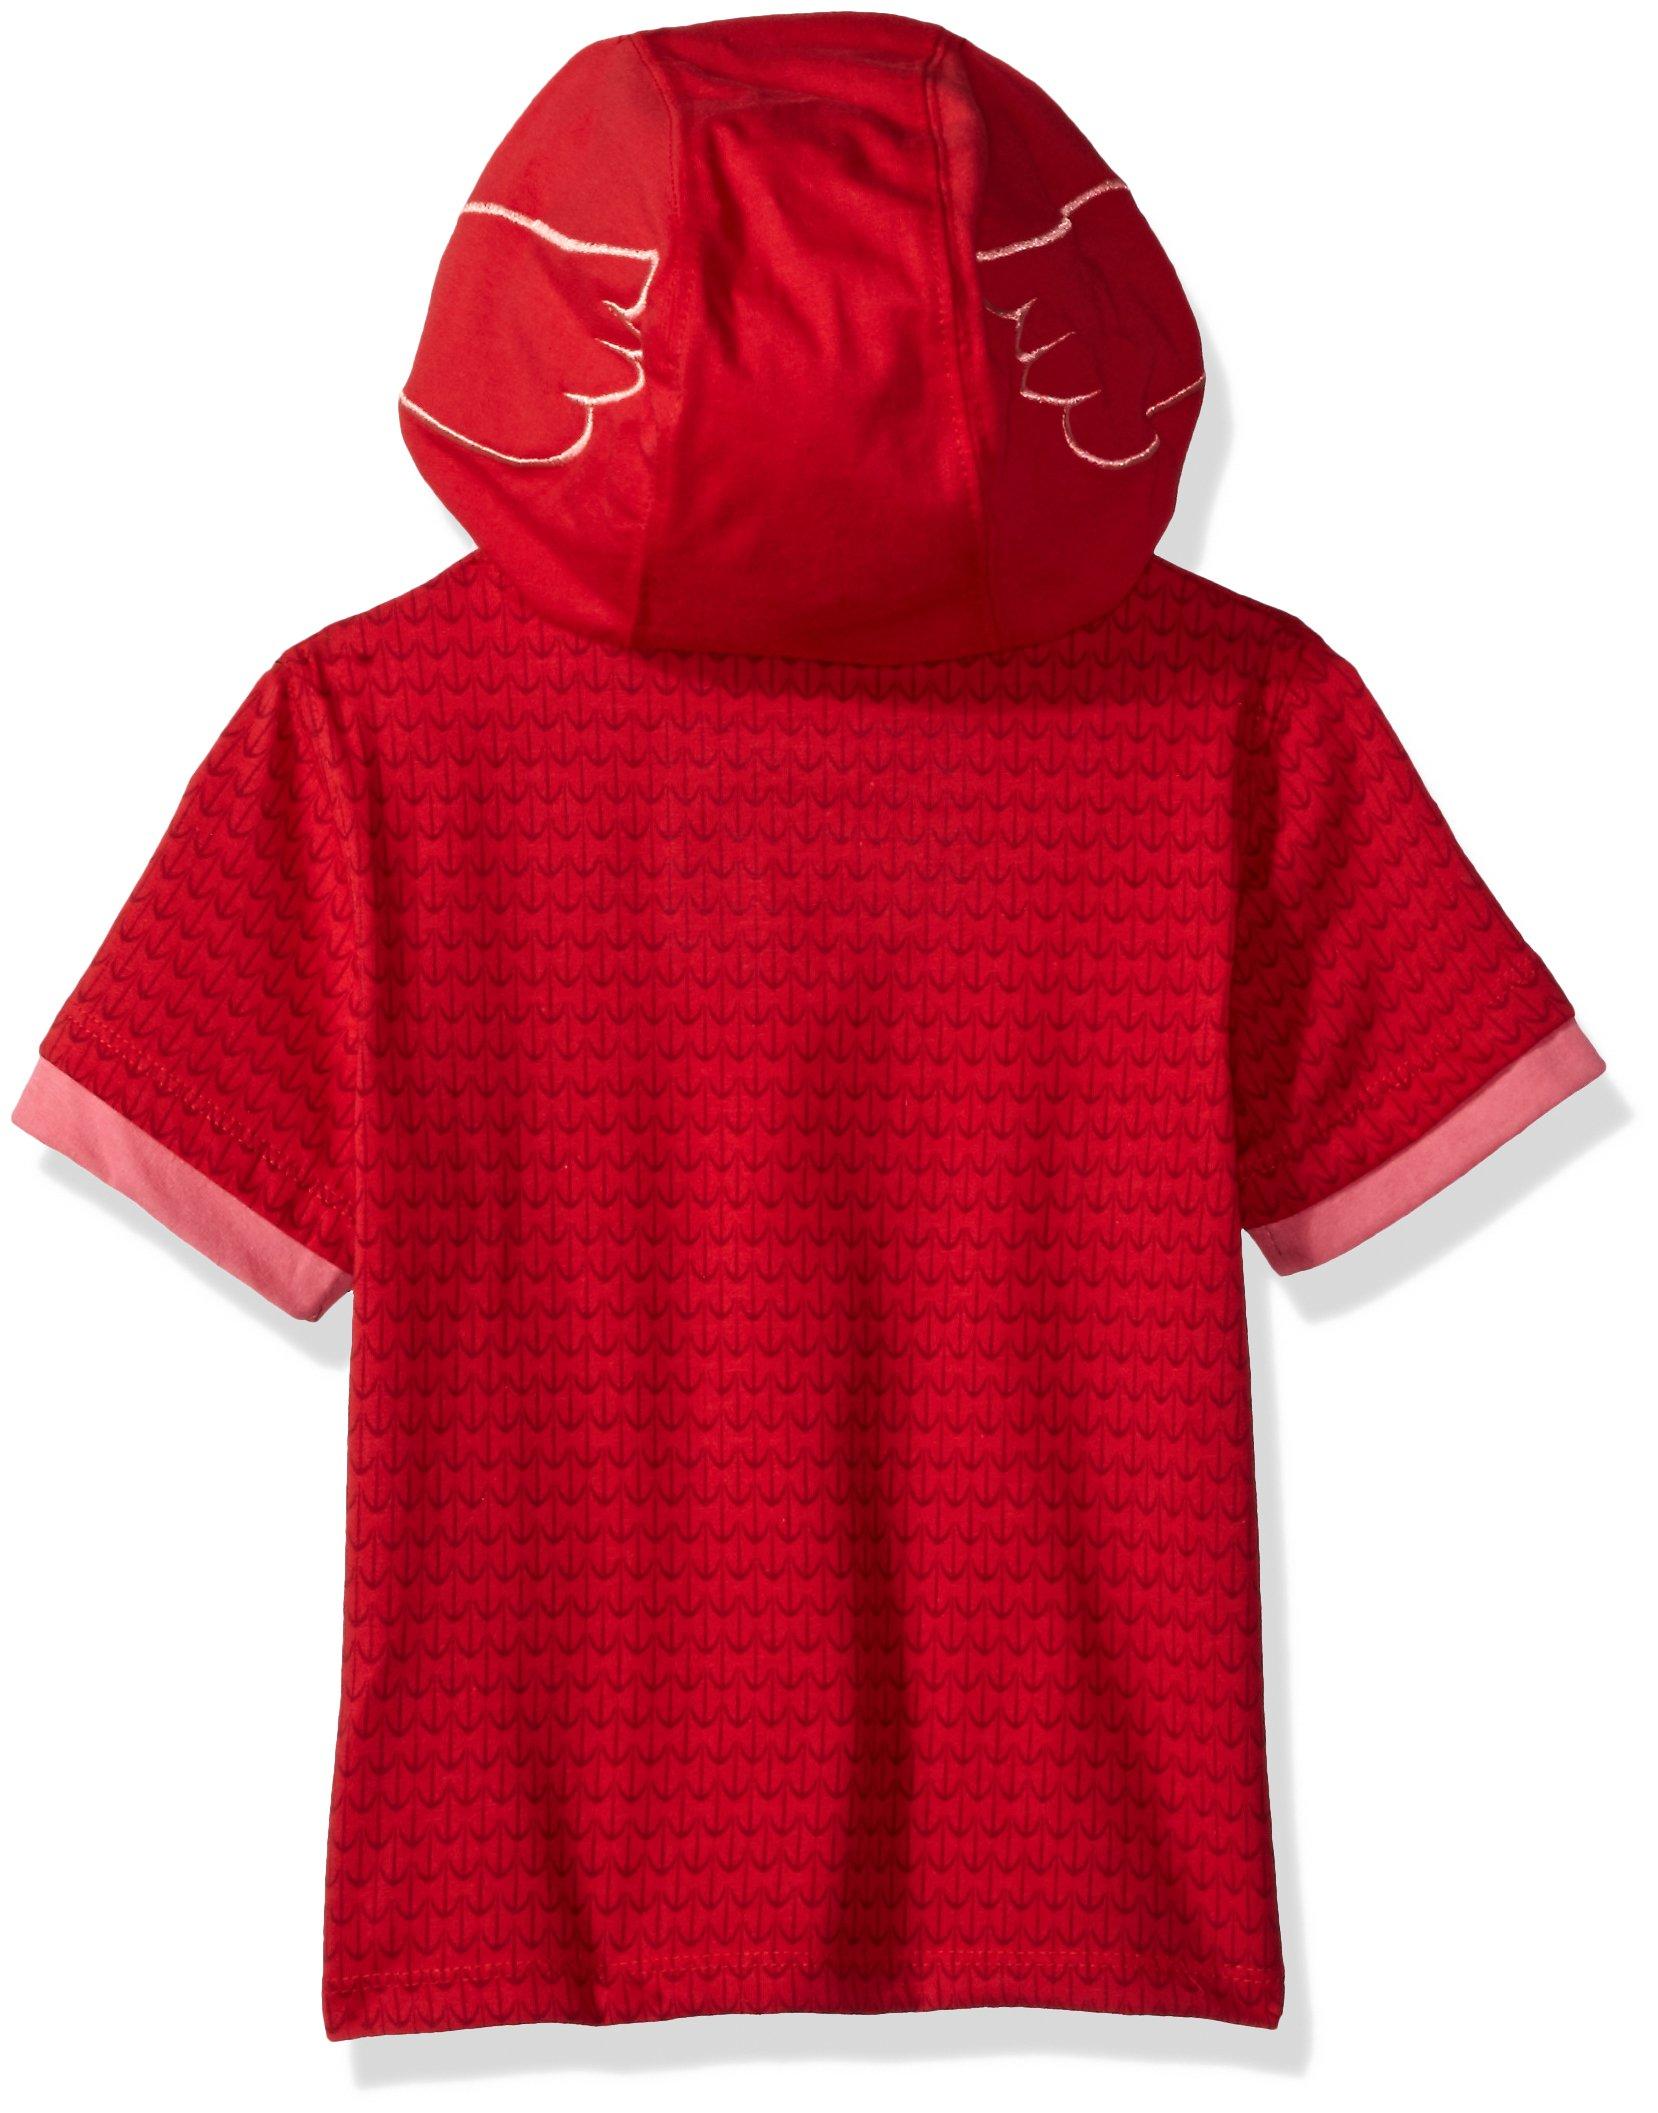 PJMASKS Girls' Tee Owlette Hoodie, Pink Short Sleeve, 4T by PJMASKS (Image #2)